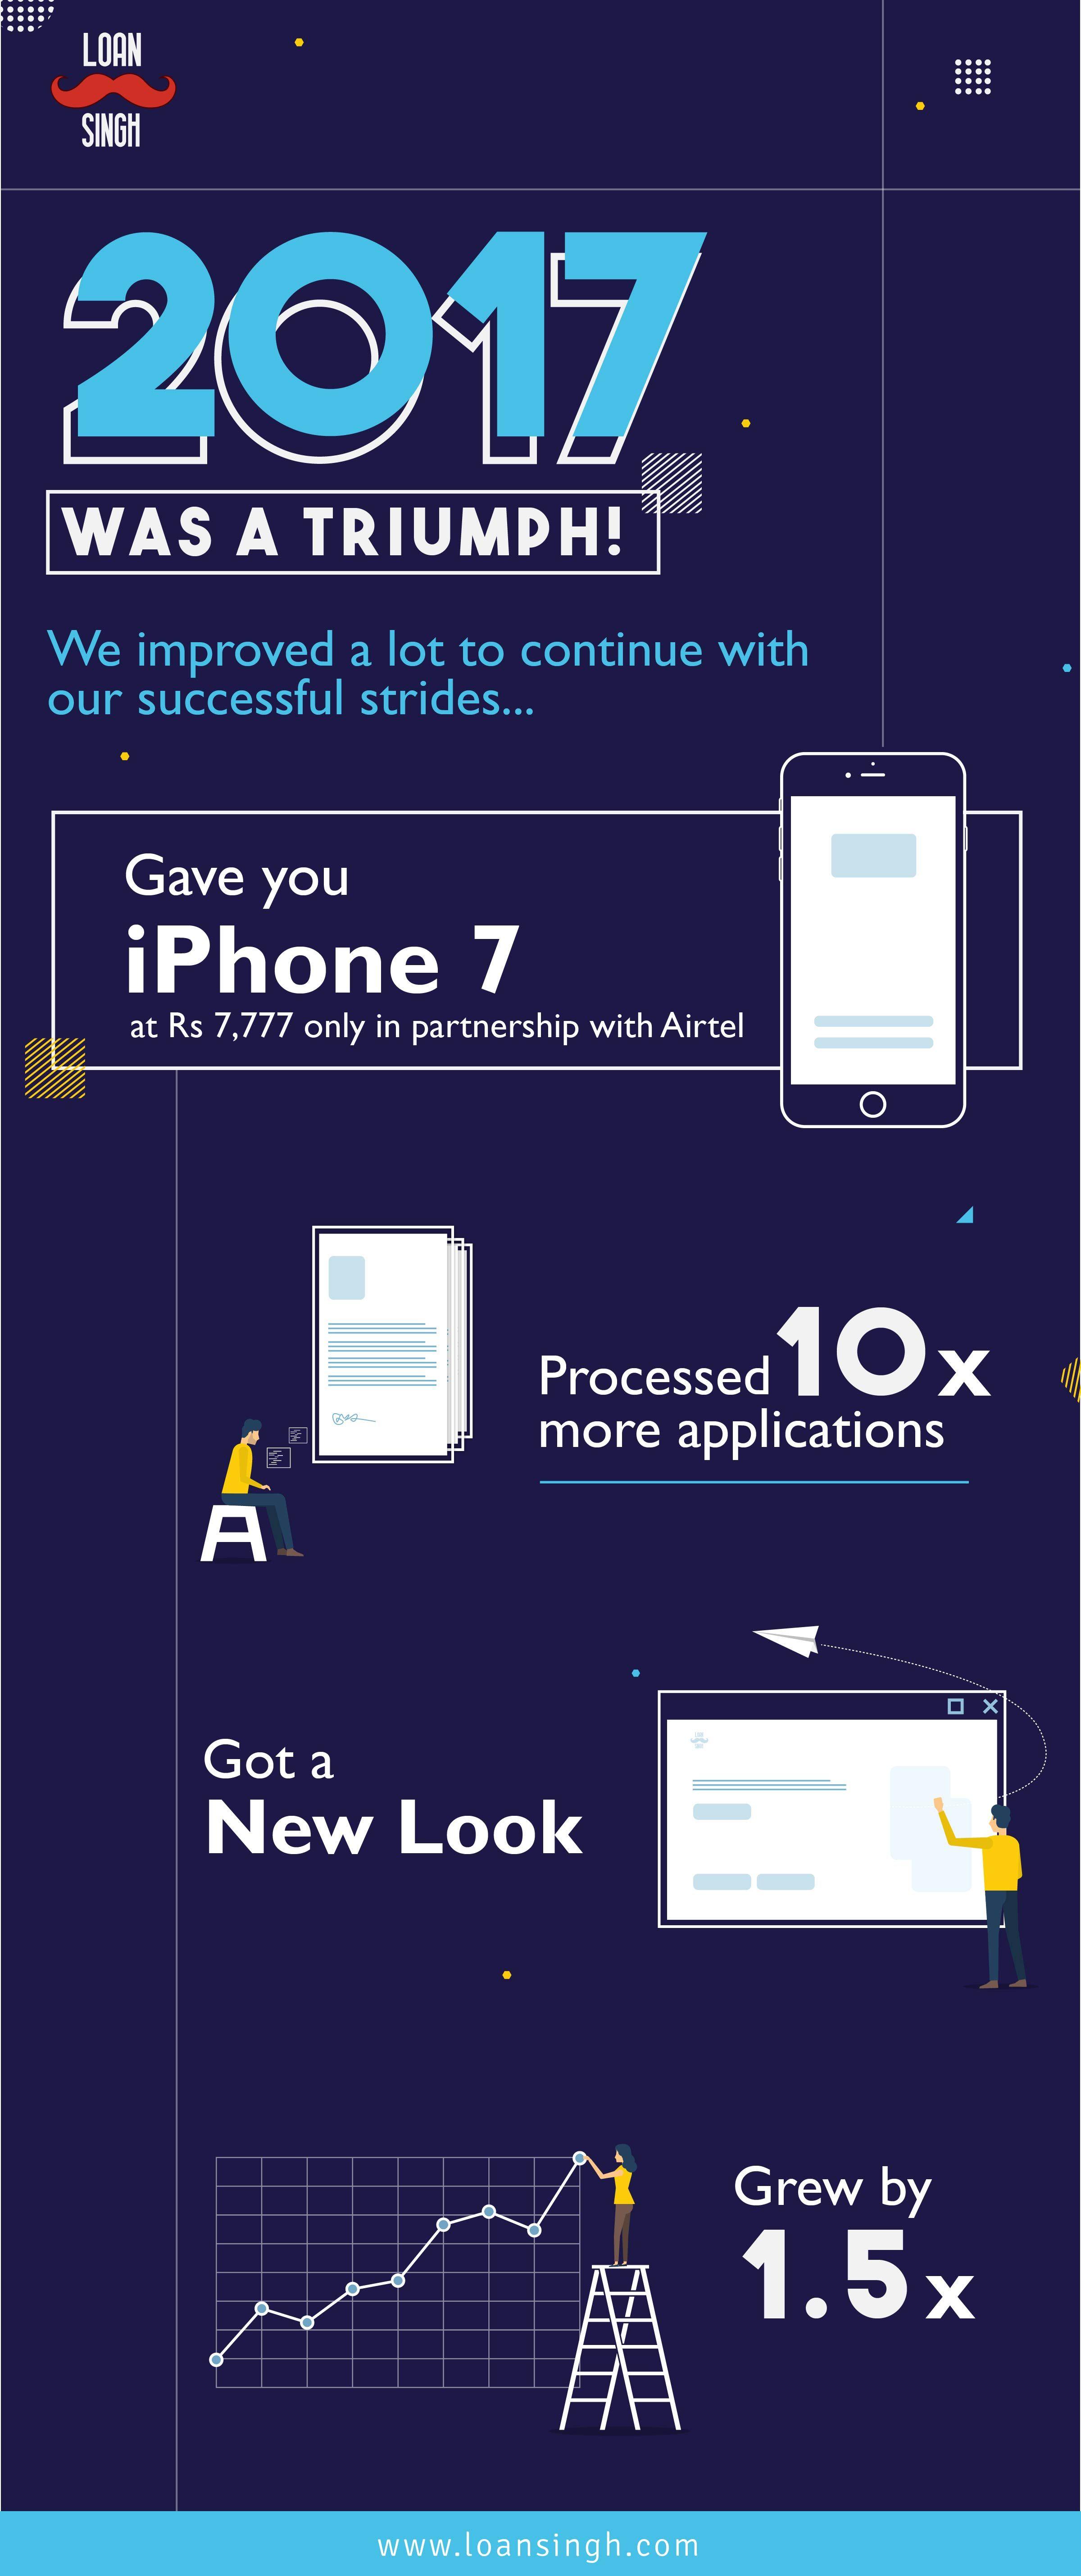 Loan Singh Is A Digital Lending Platform That Provides Small Loans